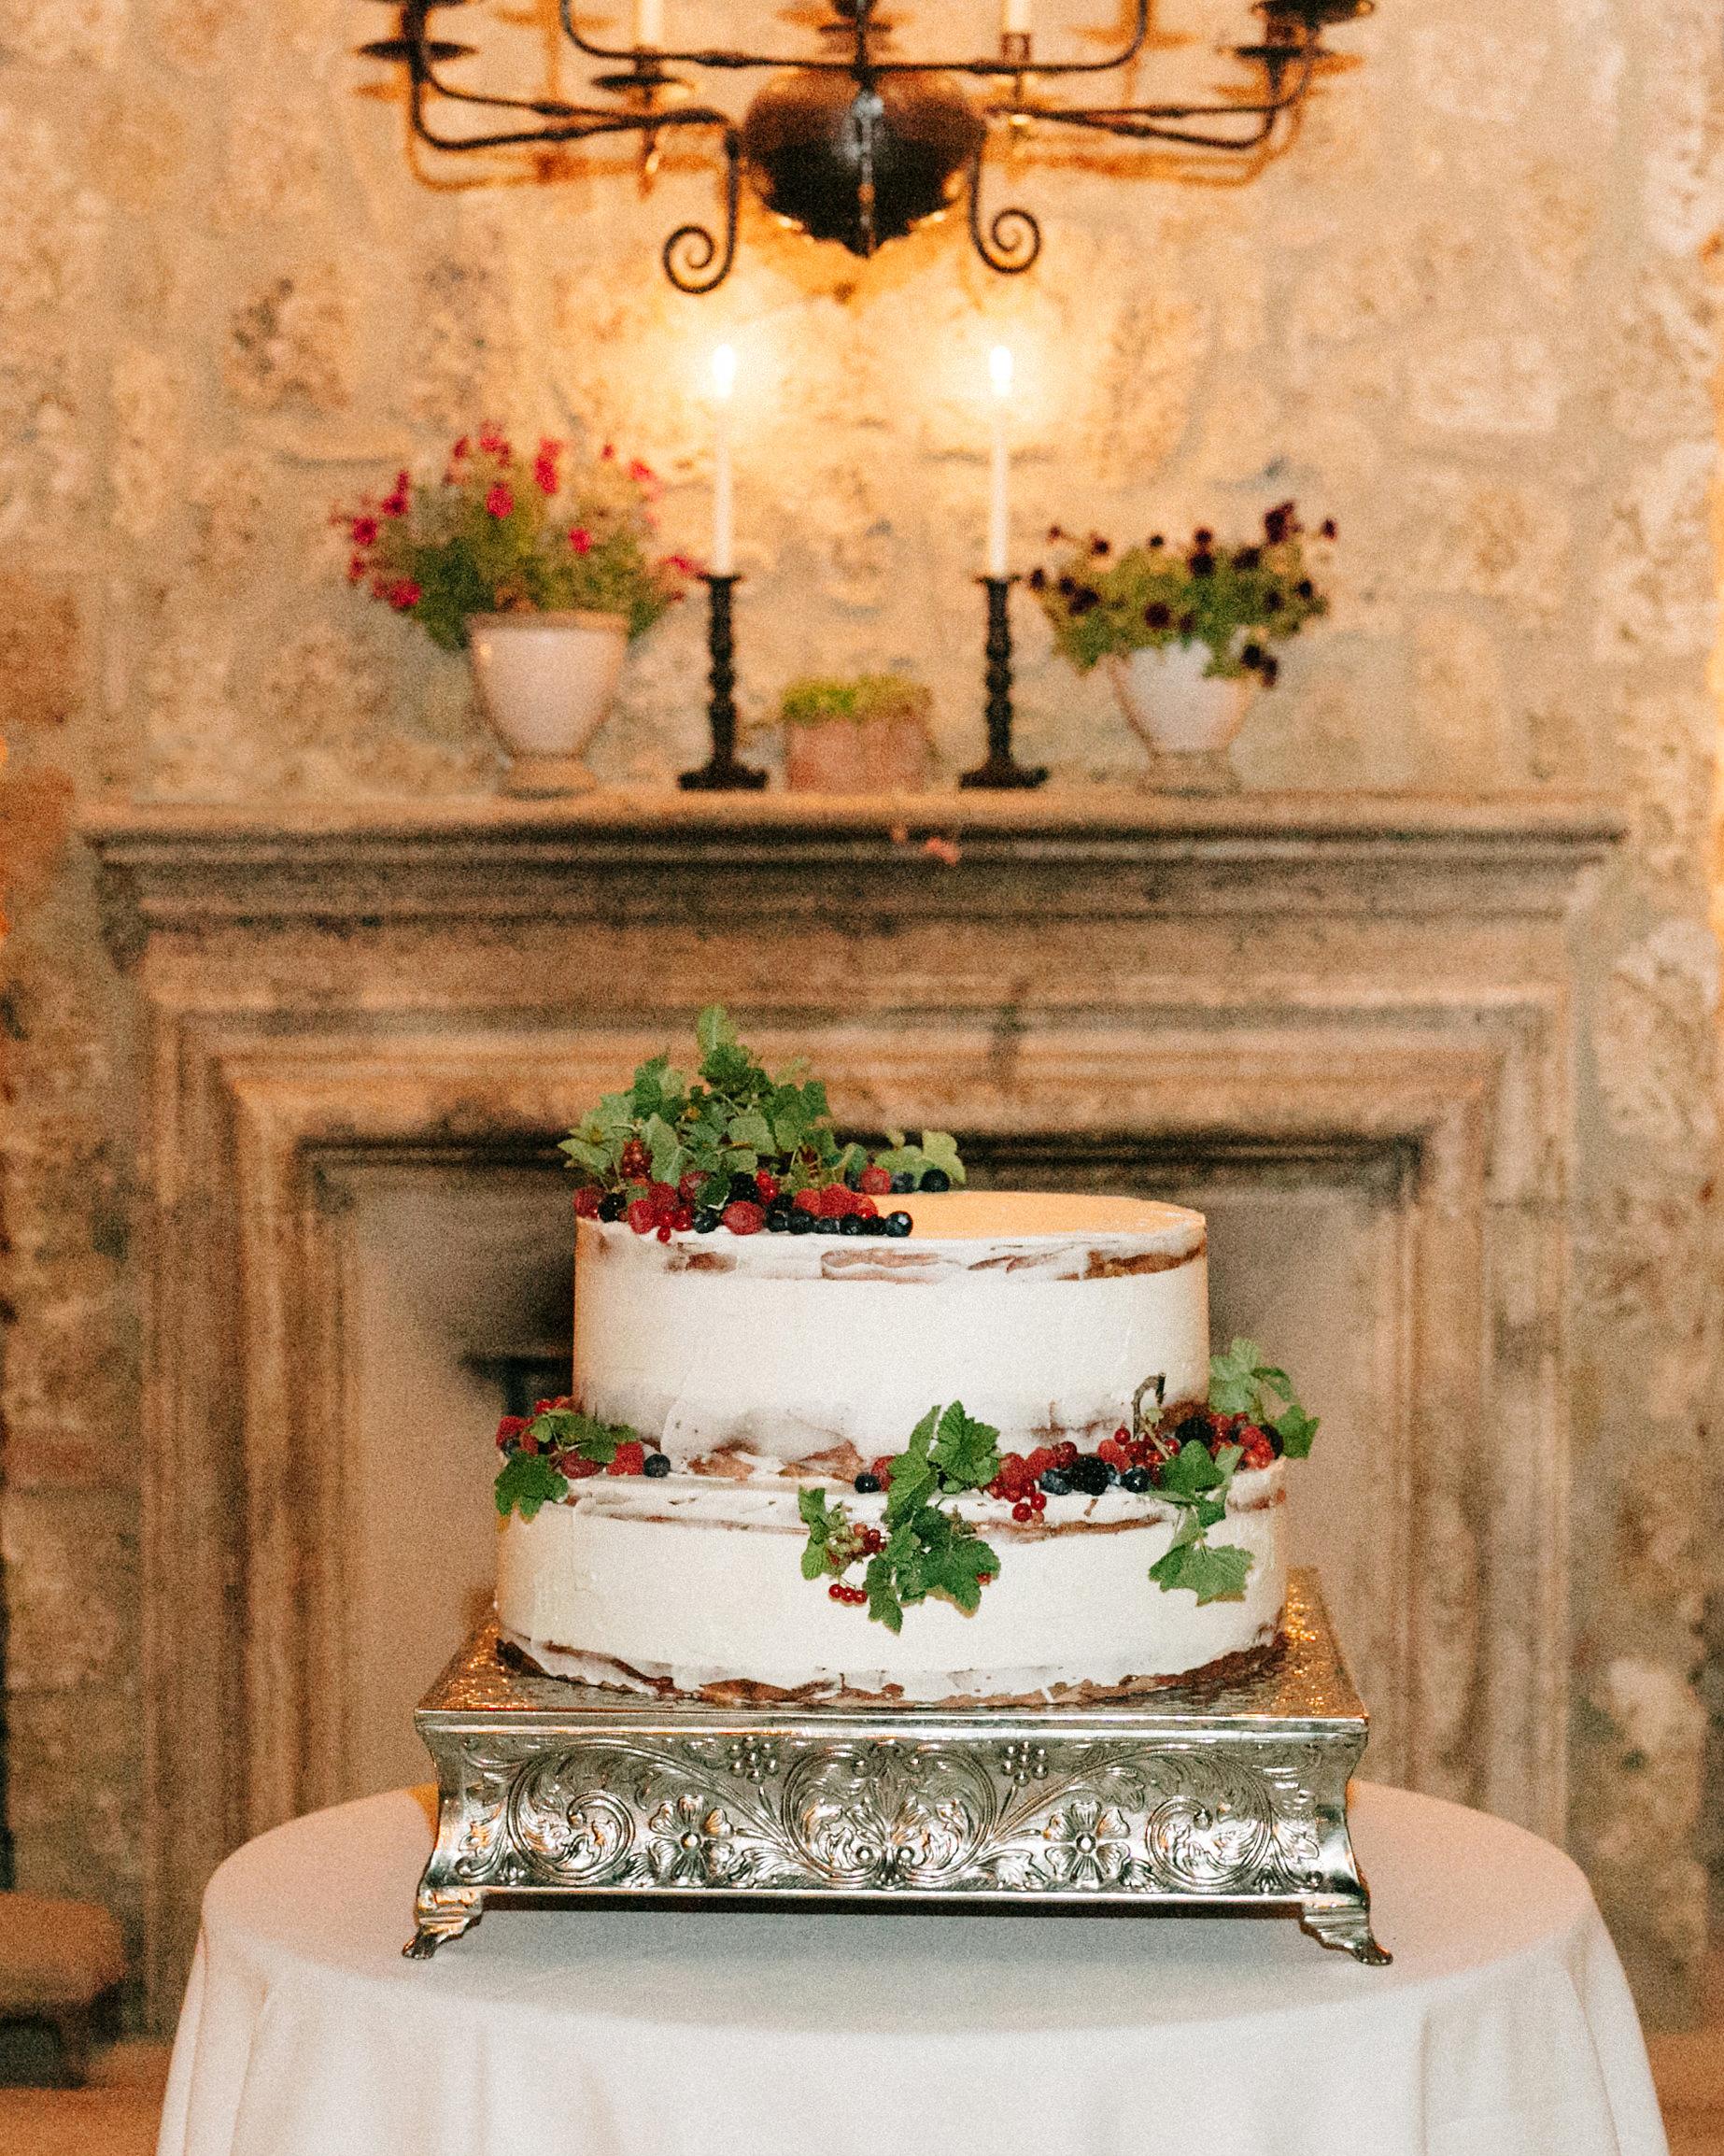 alexis zach wedding italy cake